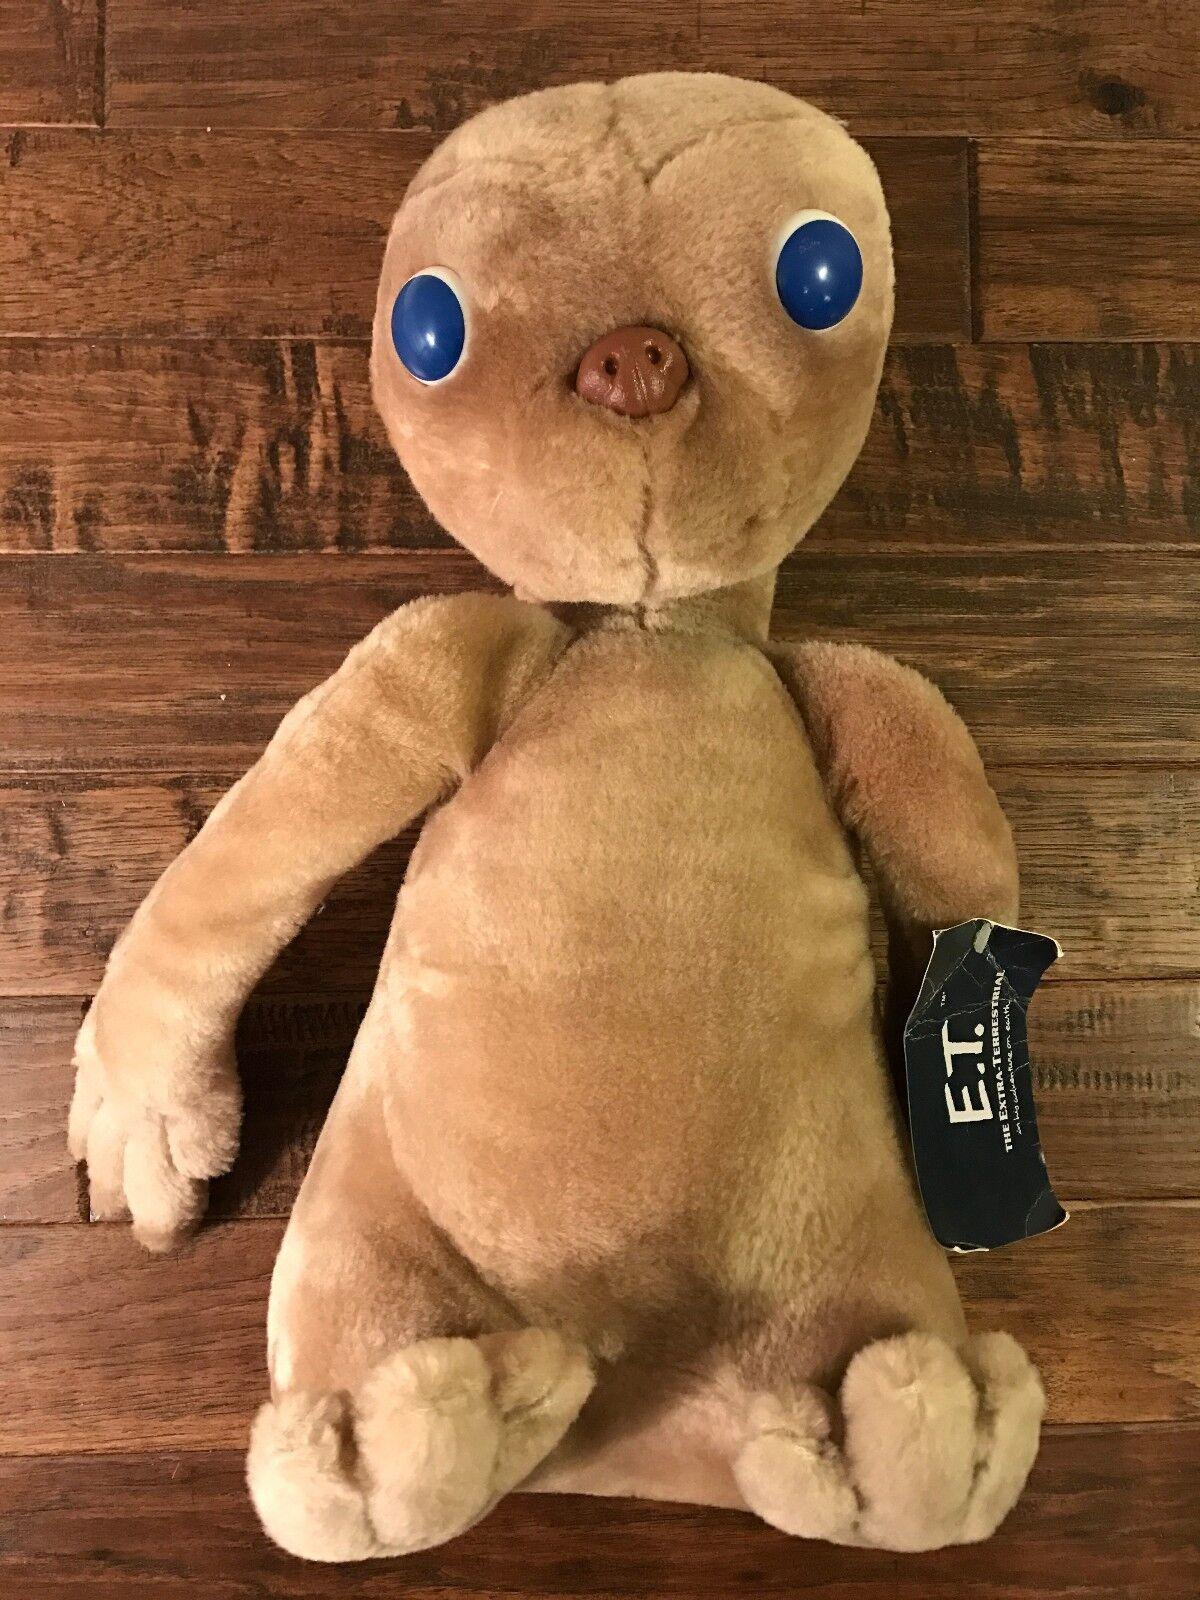 1982 Vintage Kamar  E.T.  The Extra-Terrestrial 16  Plush Stuffed Animal, RARE